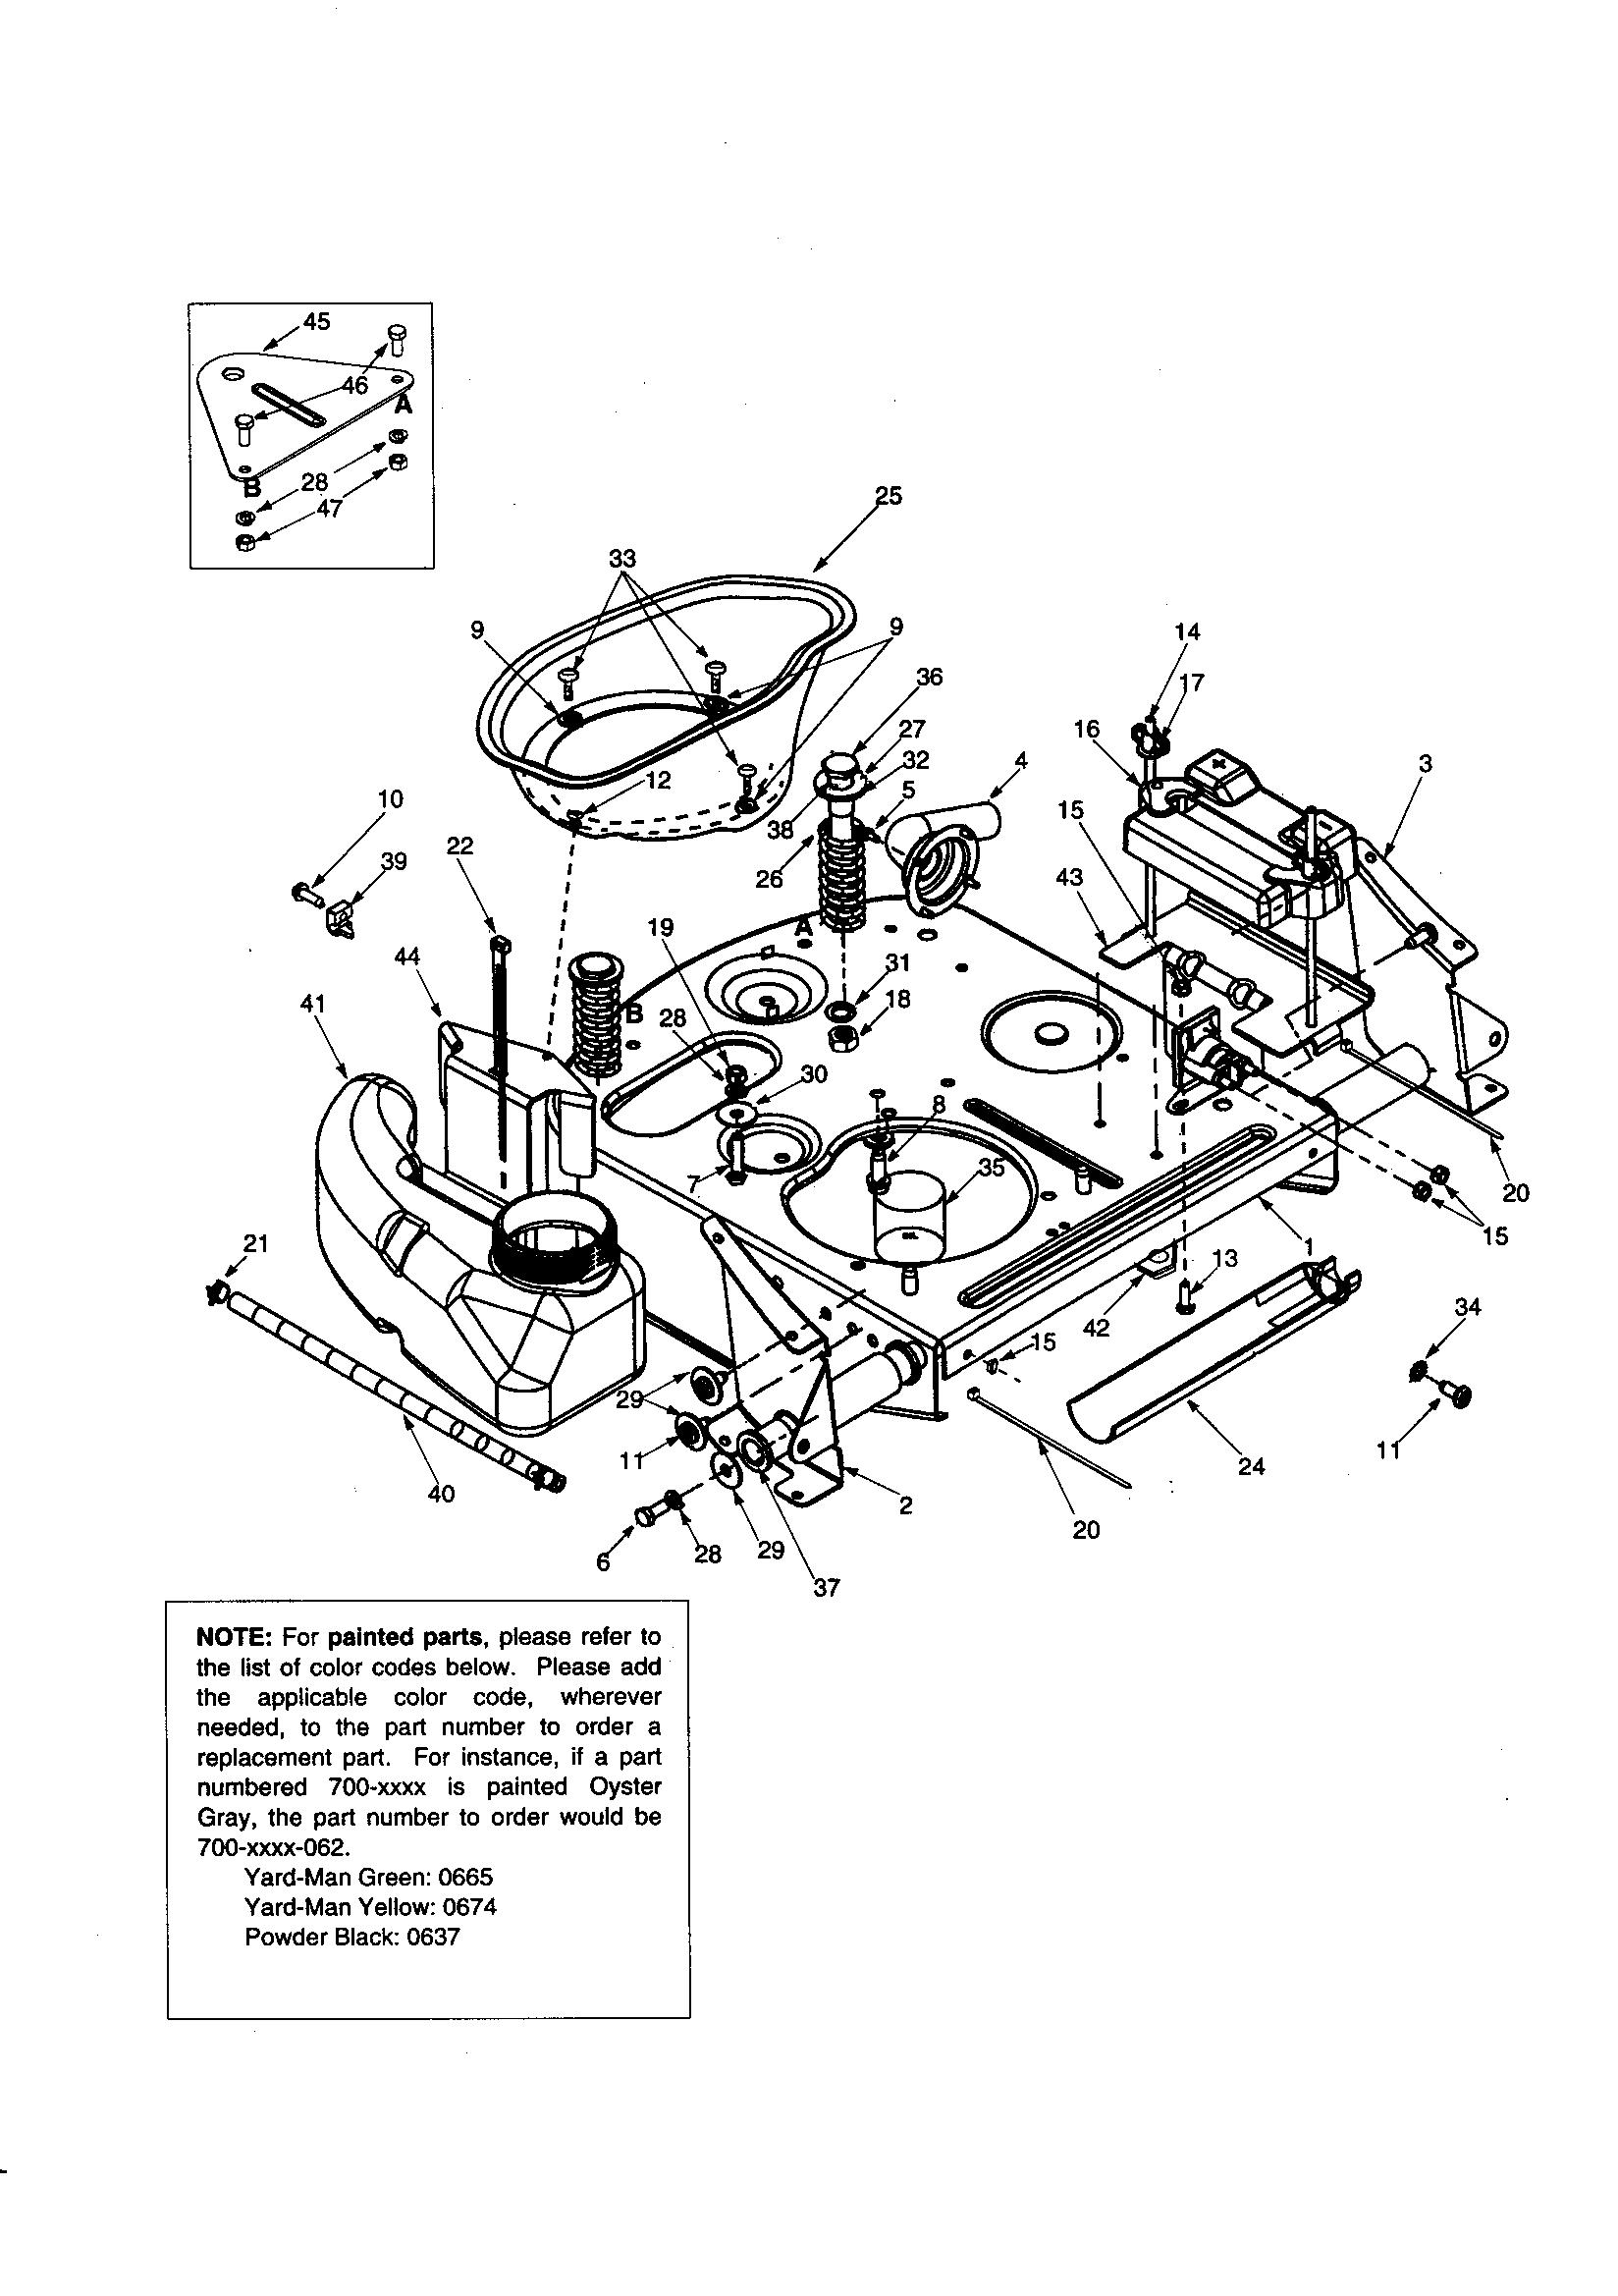 Yardman engine manual